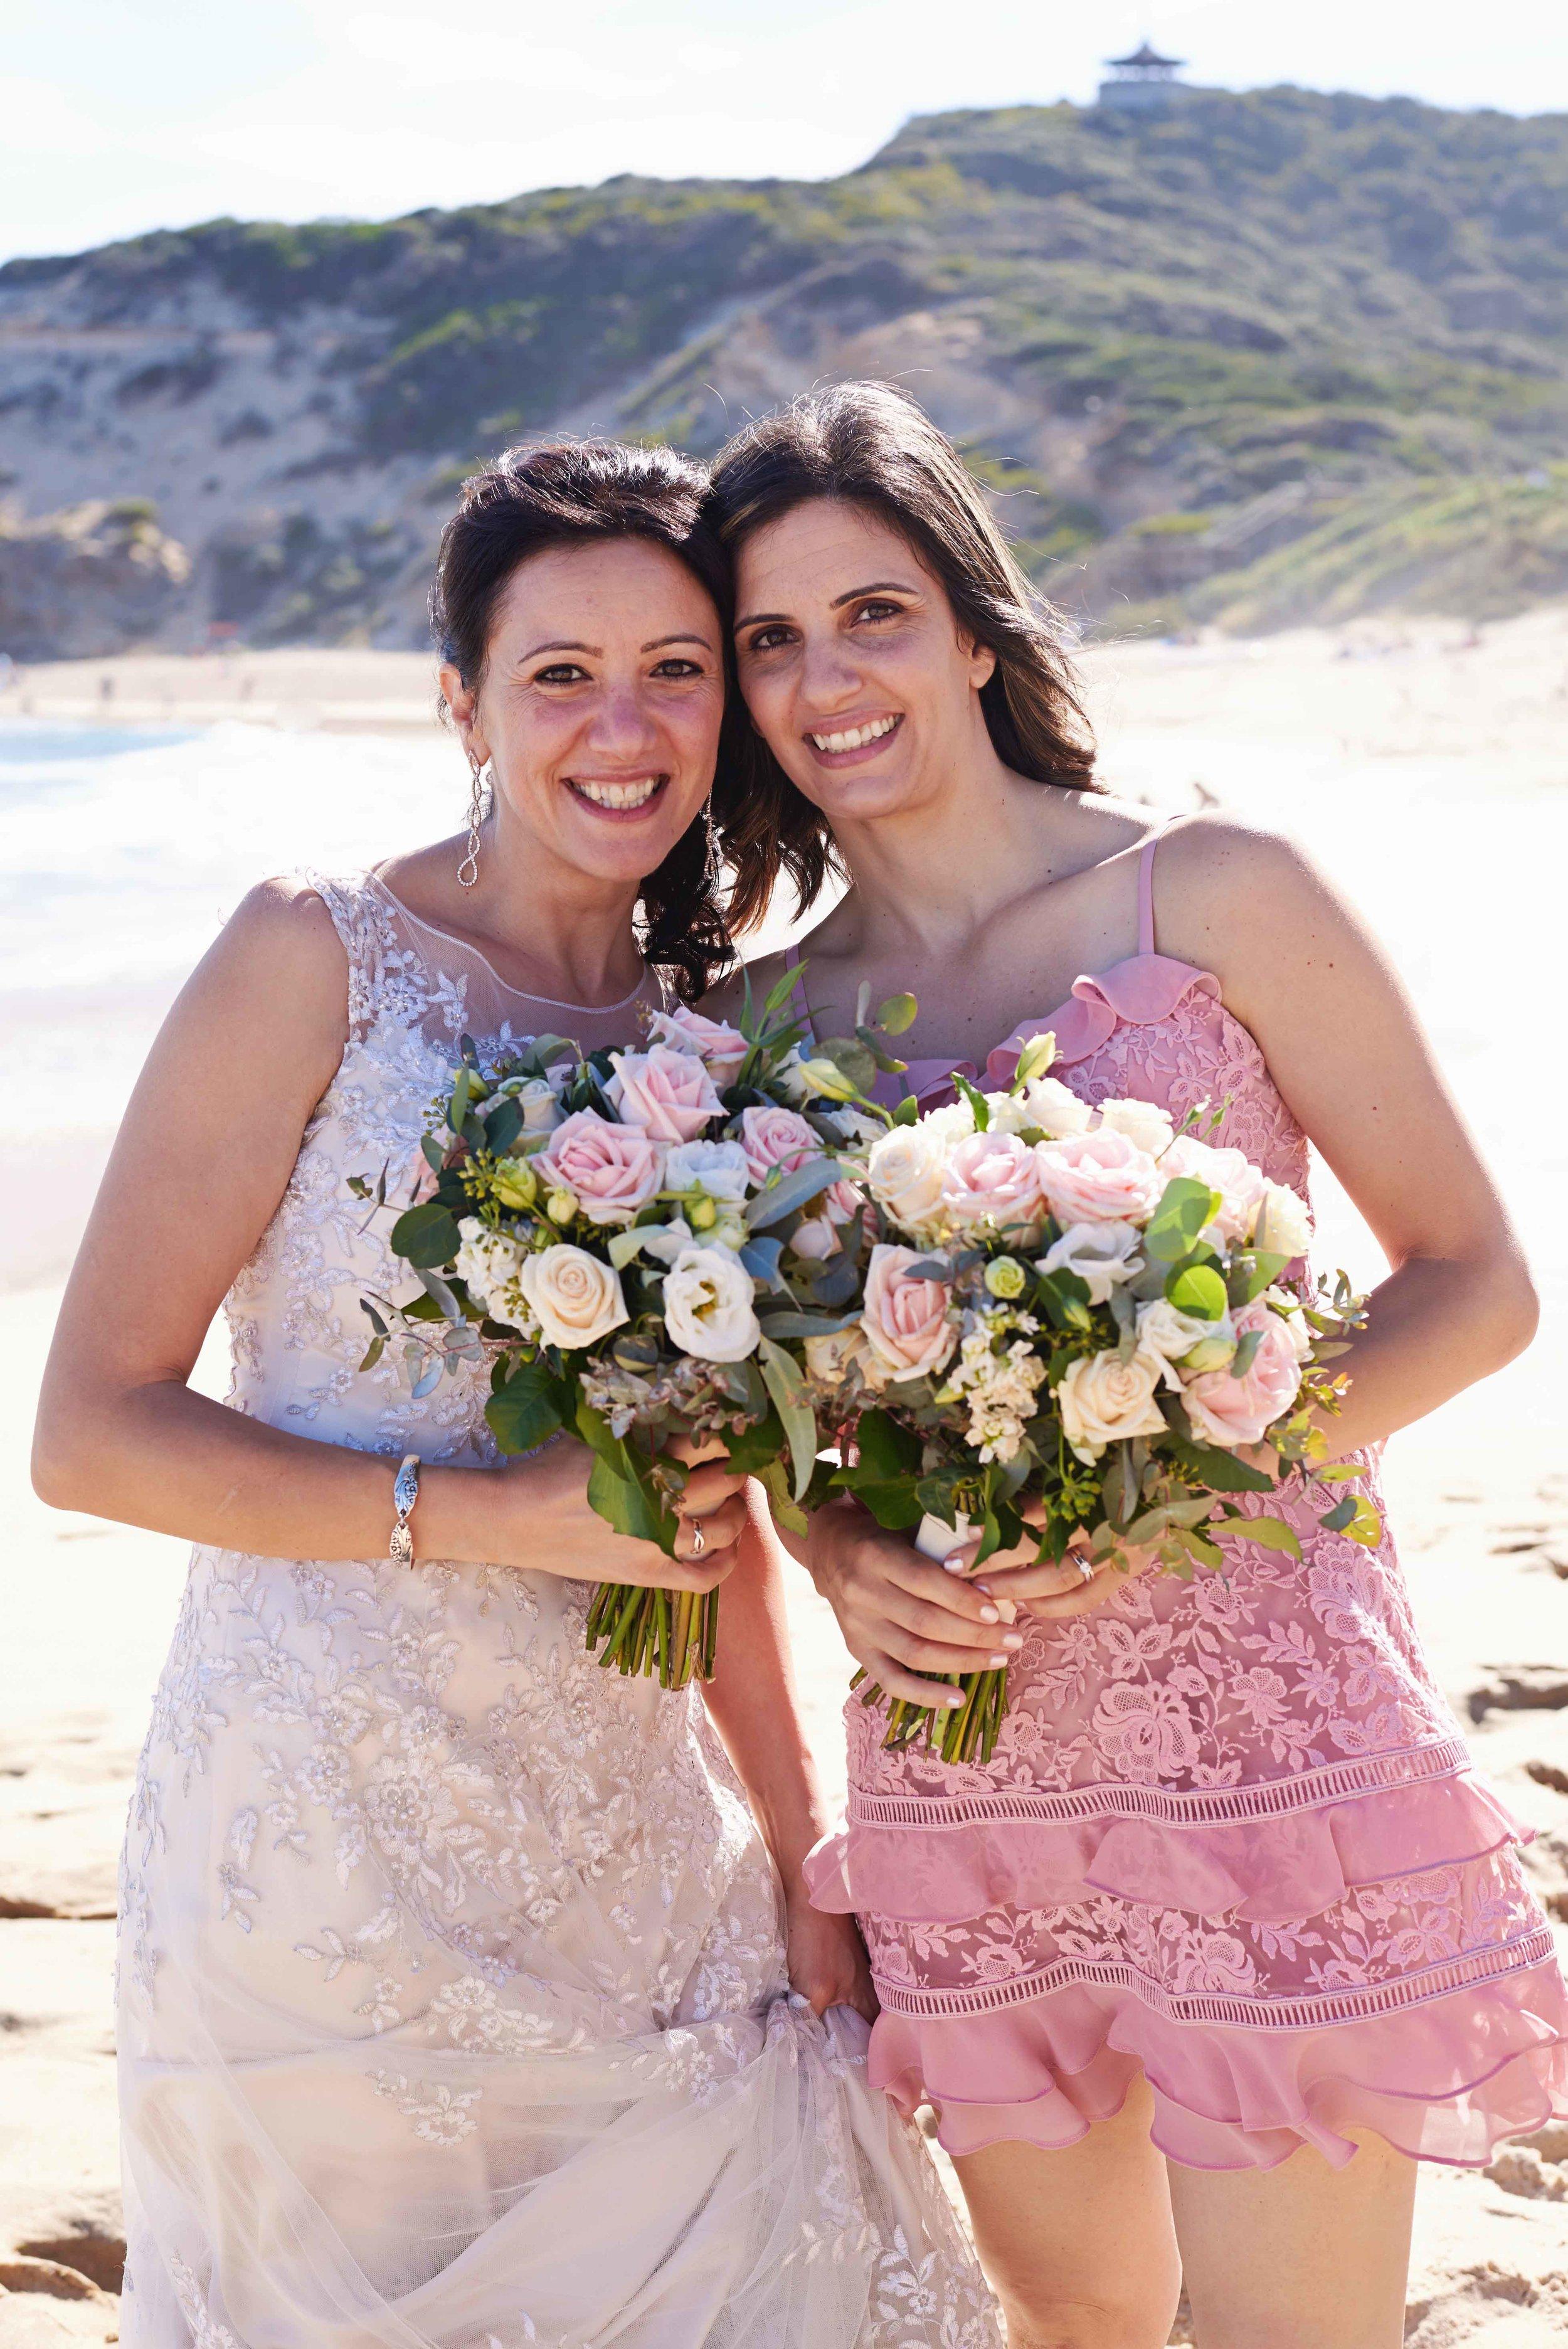 sorrento-wedding-photography-all-smiles-marissa-jade-photography-125.jpg